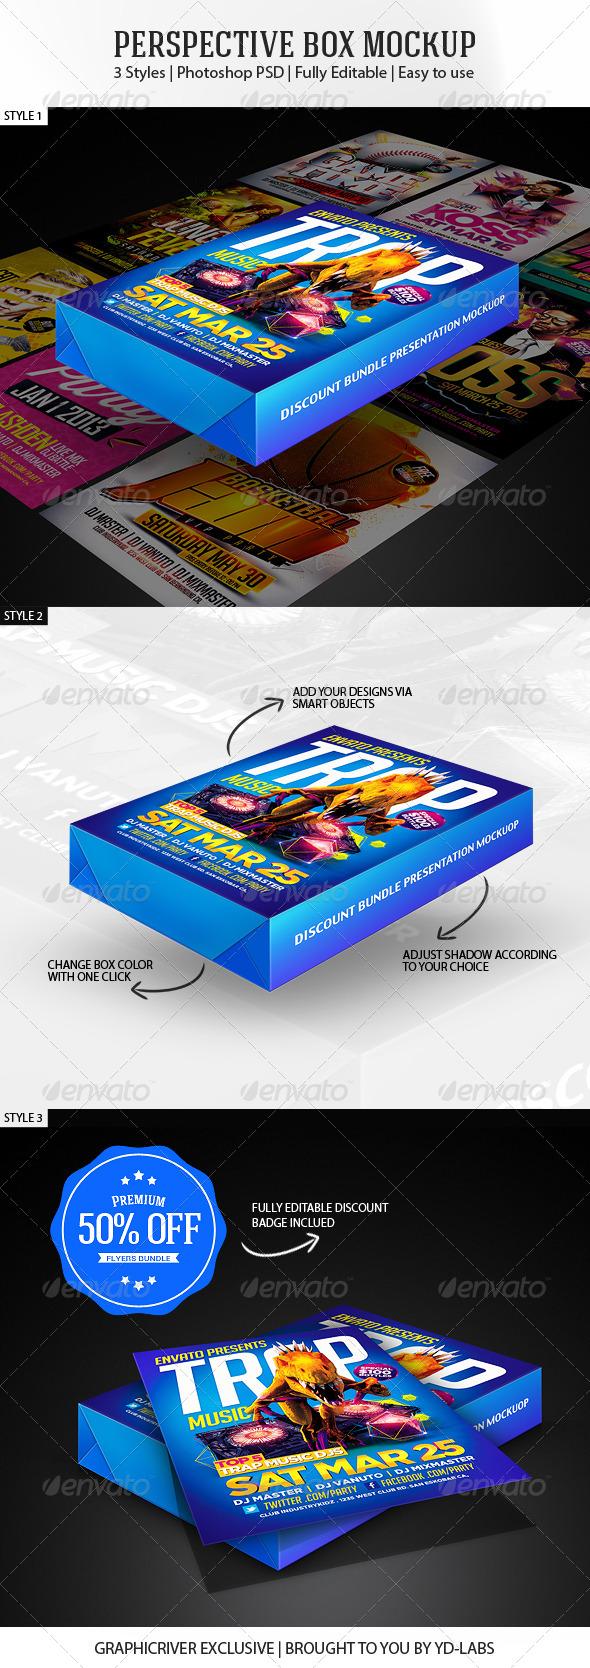 Perspective Box Mockup V1